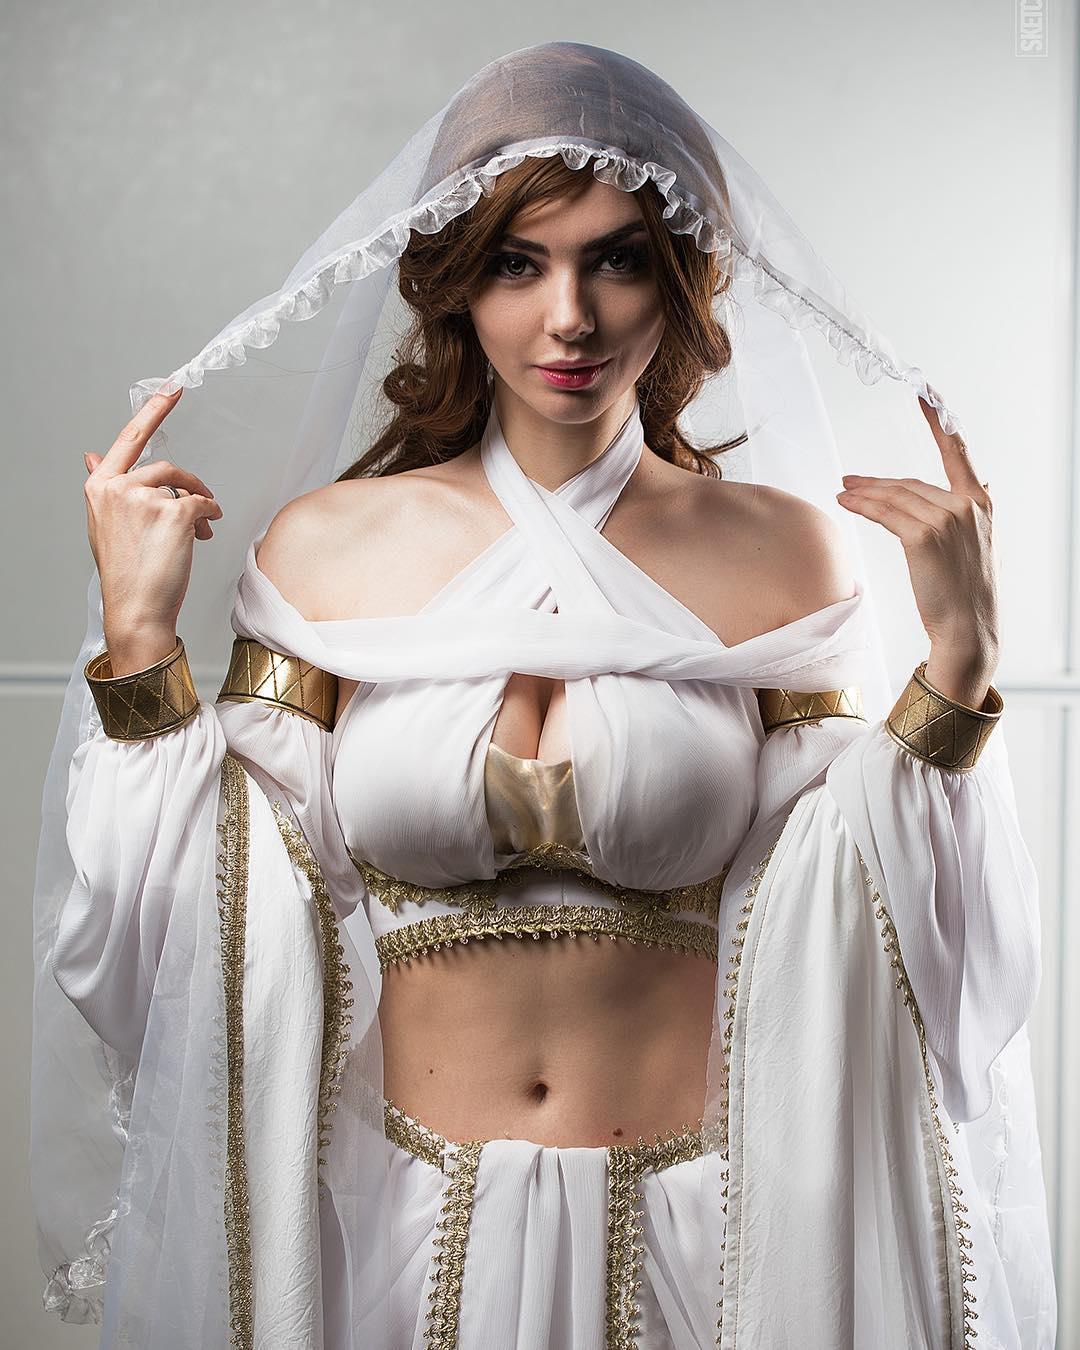 Lindo Cosplay Feminino da Gwynevere Princesa da Luz Solar - Dark Souls - Cosplays Femininos de Games 01